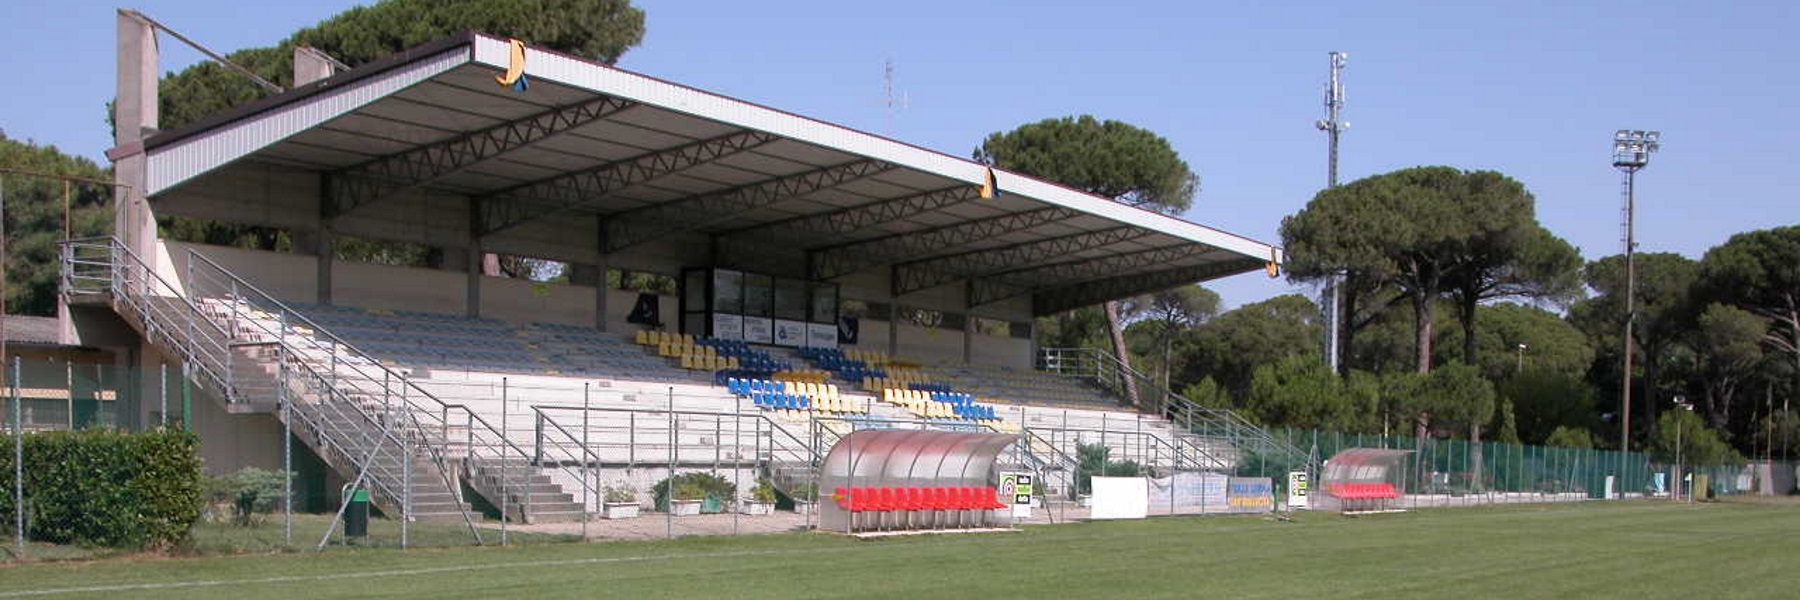 Stadio dei Pini Germano Todoli